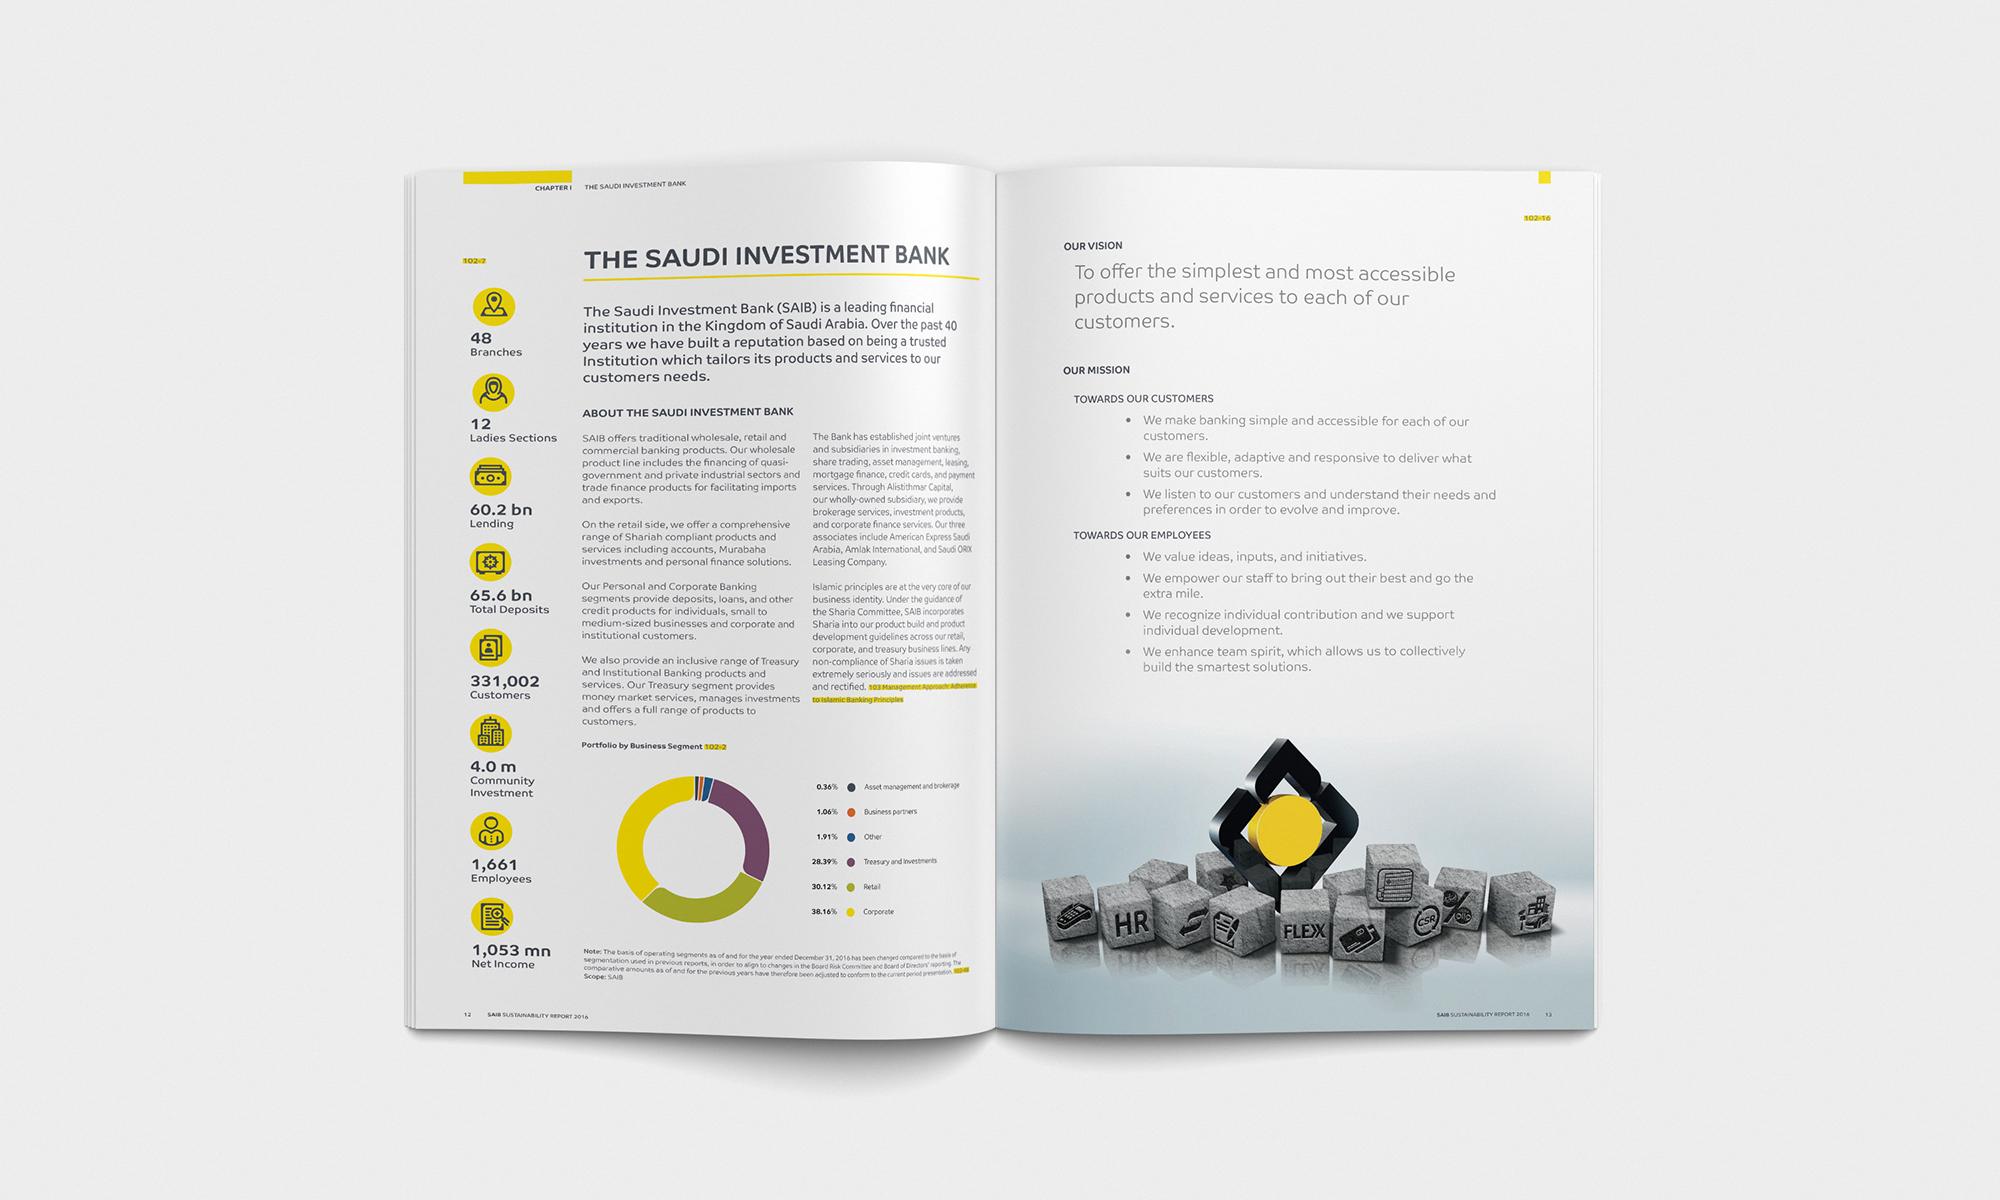 Saudi Investment Bank Sürdürülebilirlik Raporu 2016